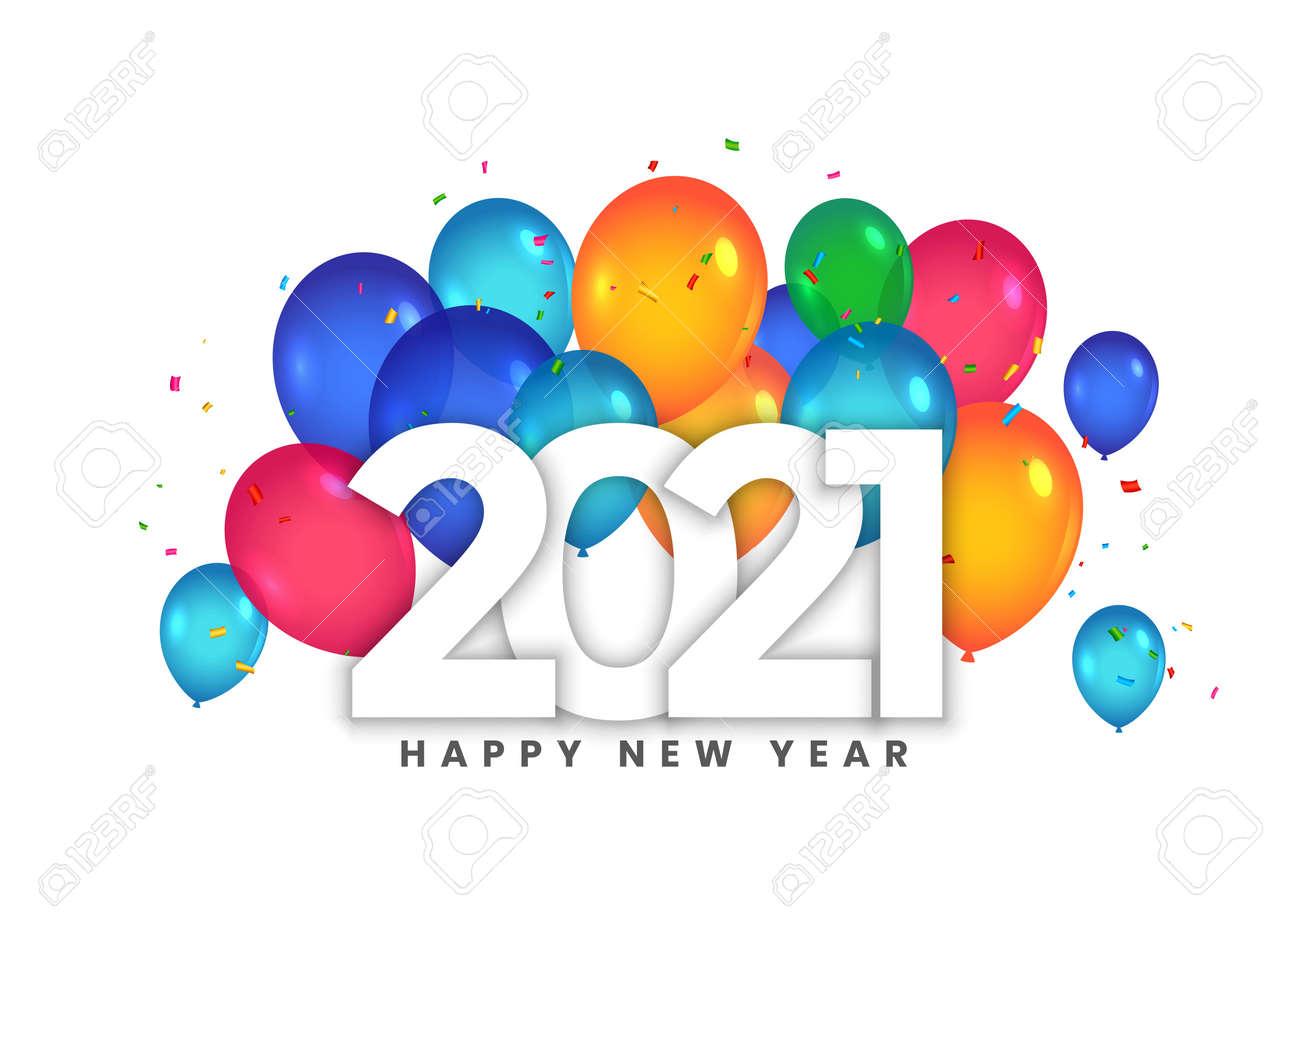 happy new year 2021 balloons celebration background design - 158511011